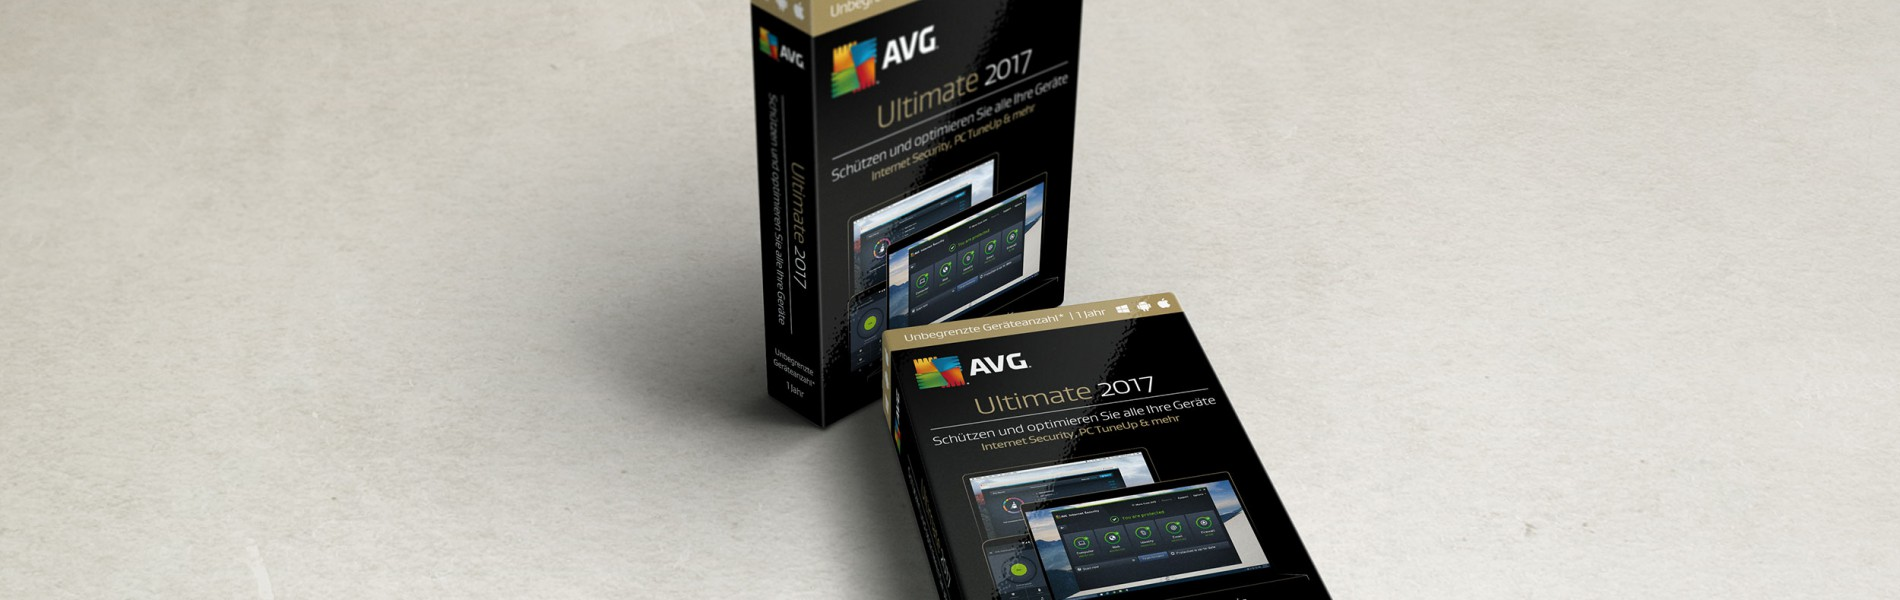 AVG Ultimate 2017 – unbegrenzte Geräte